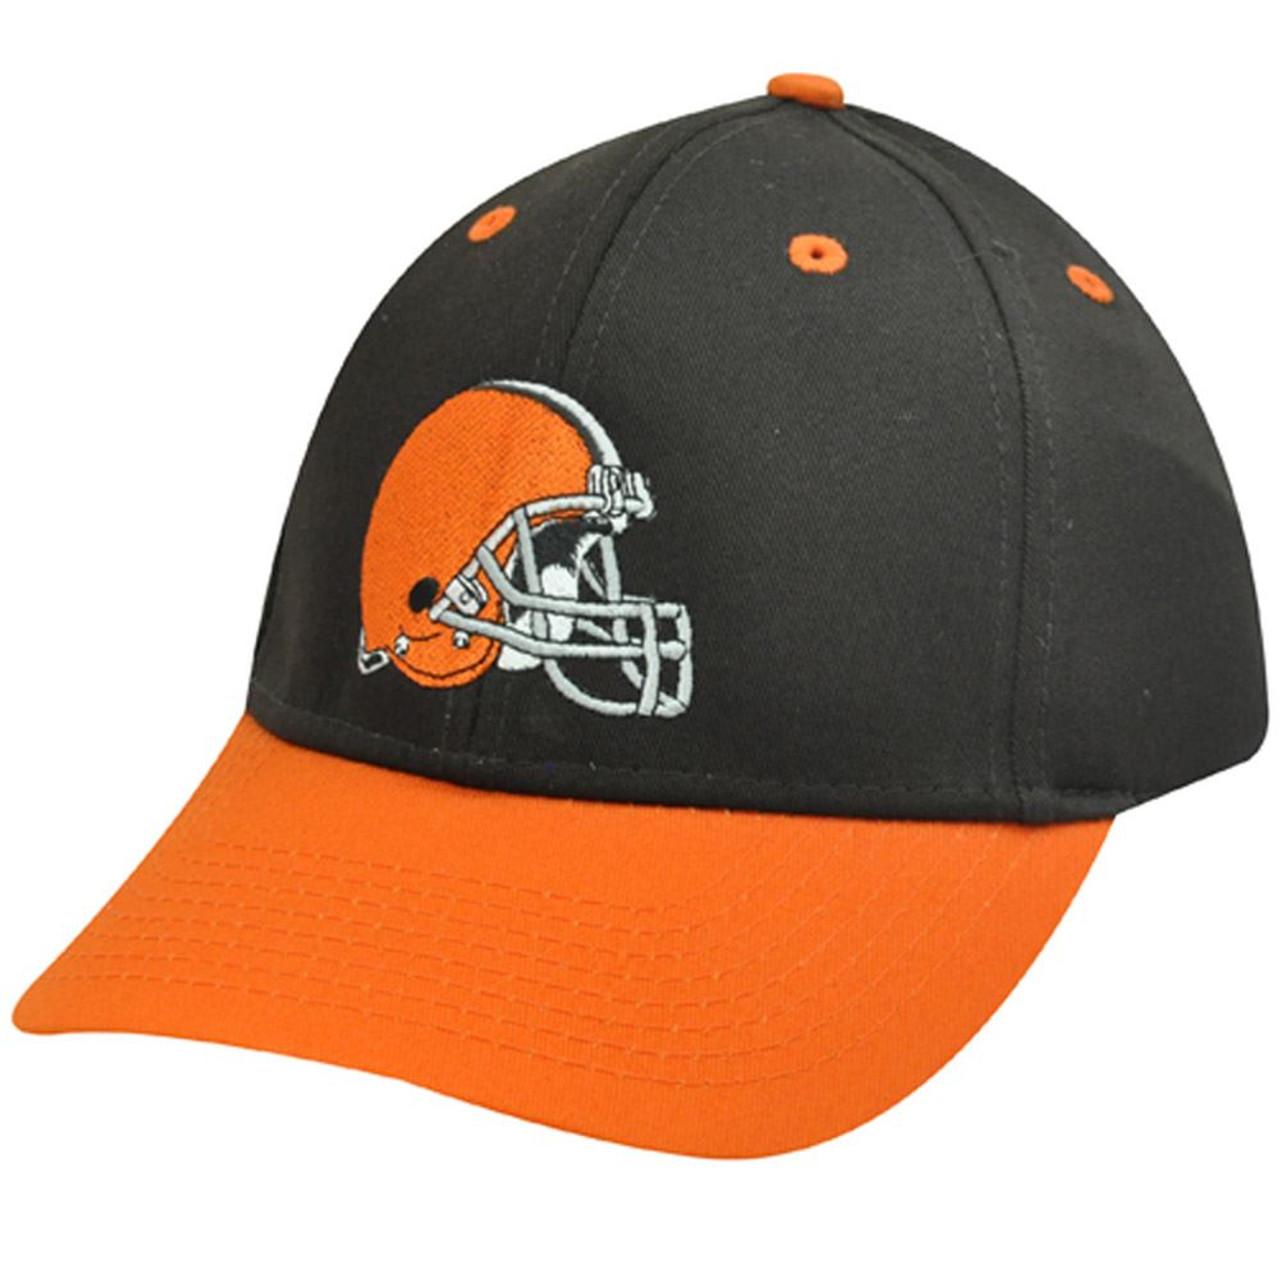 a12e3efd NFL Cleveland Browns Brown Orange Helmet Logo Cotton OSFA Mens Adult Hat Cap